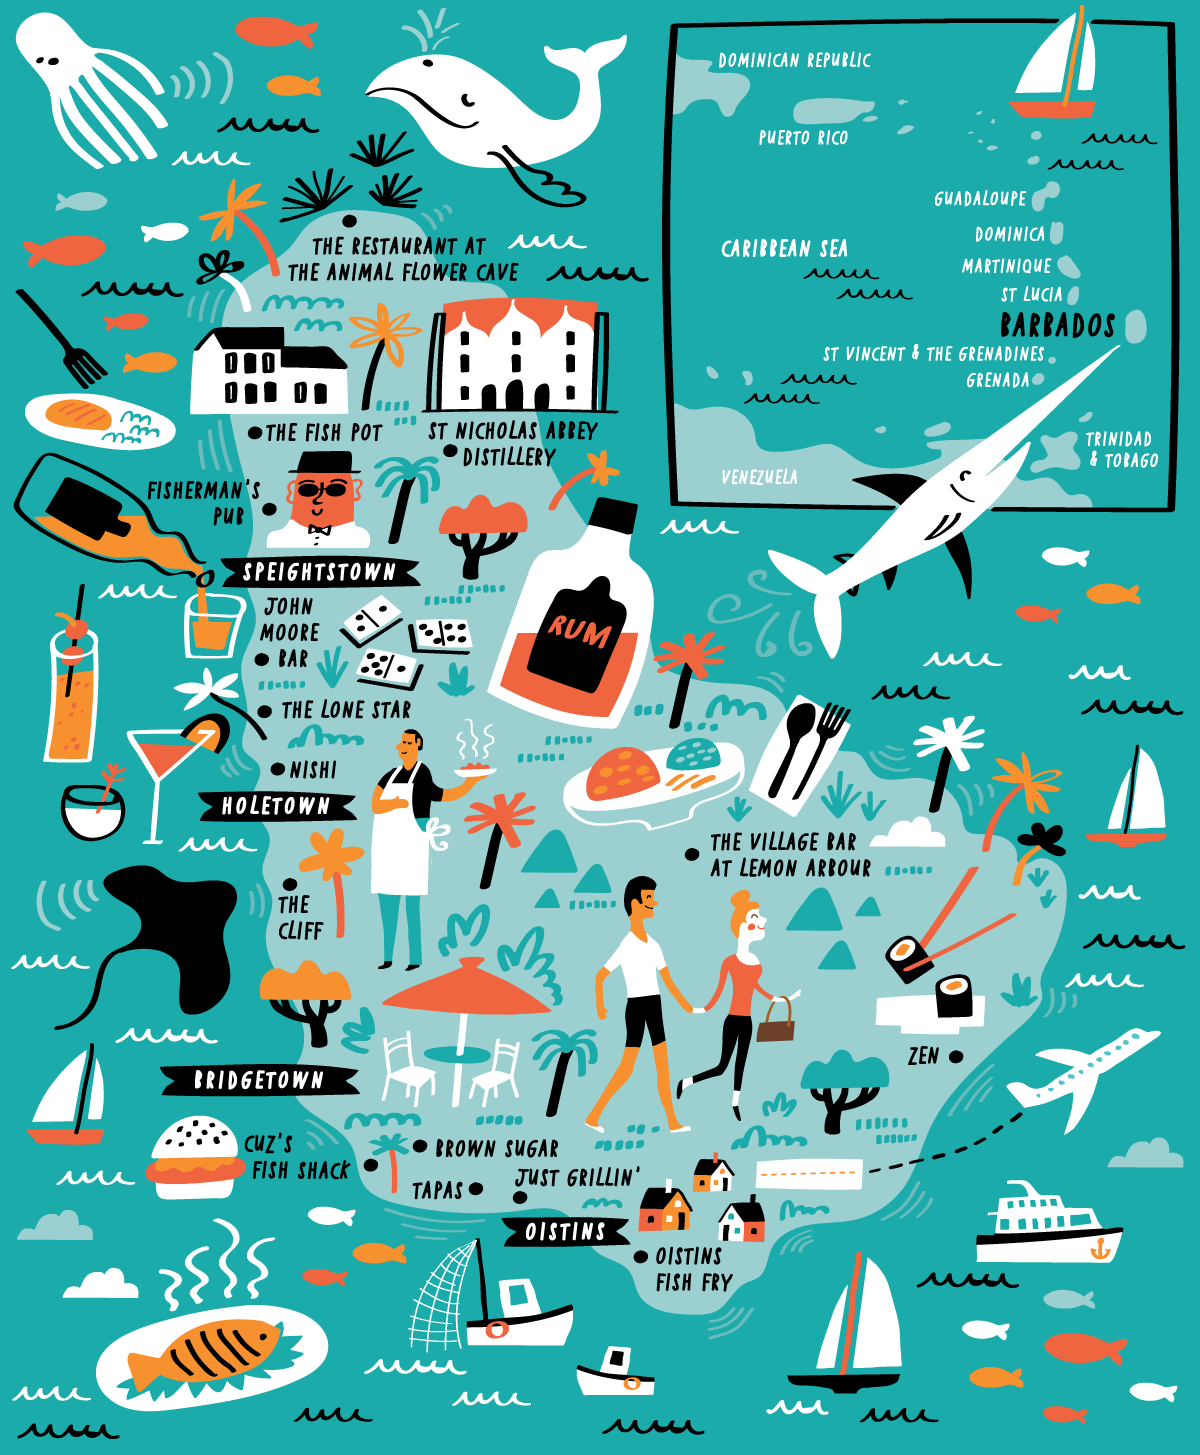 Barbados-Map-by-Nate-Padavick-1200.png